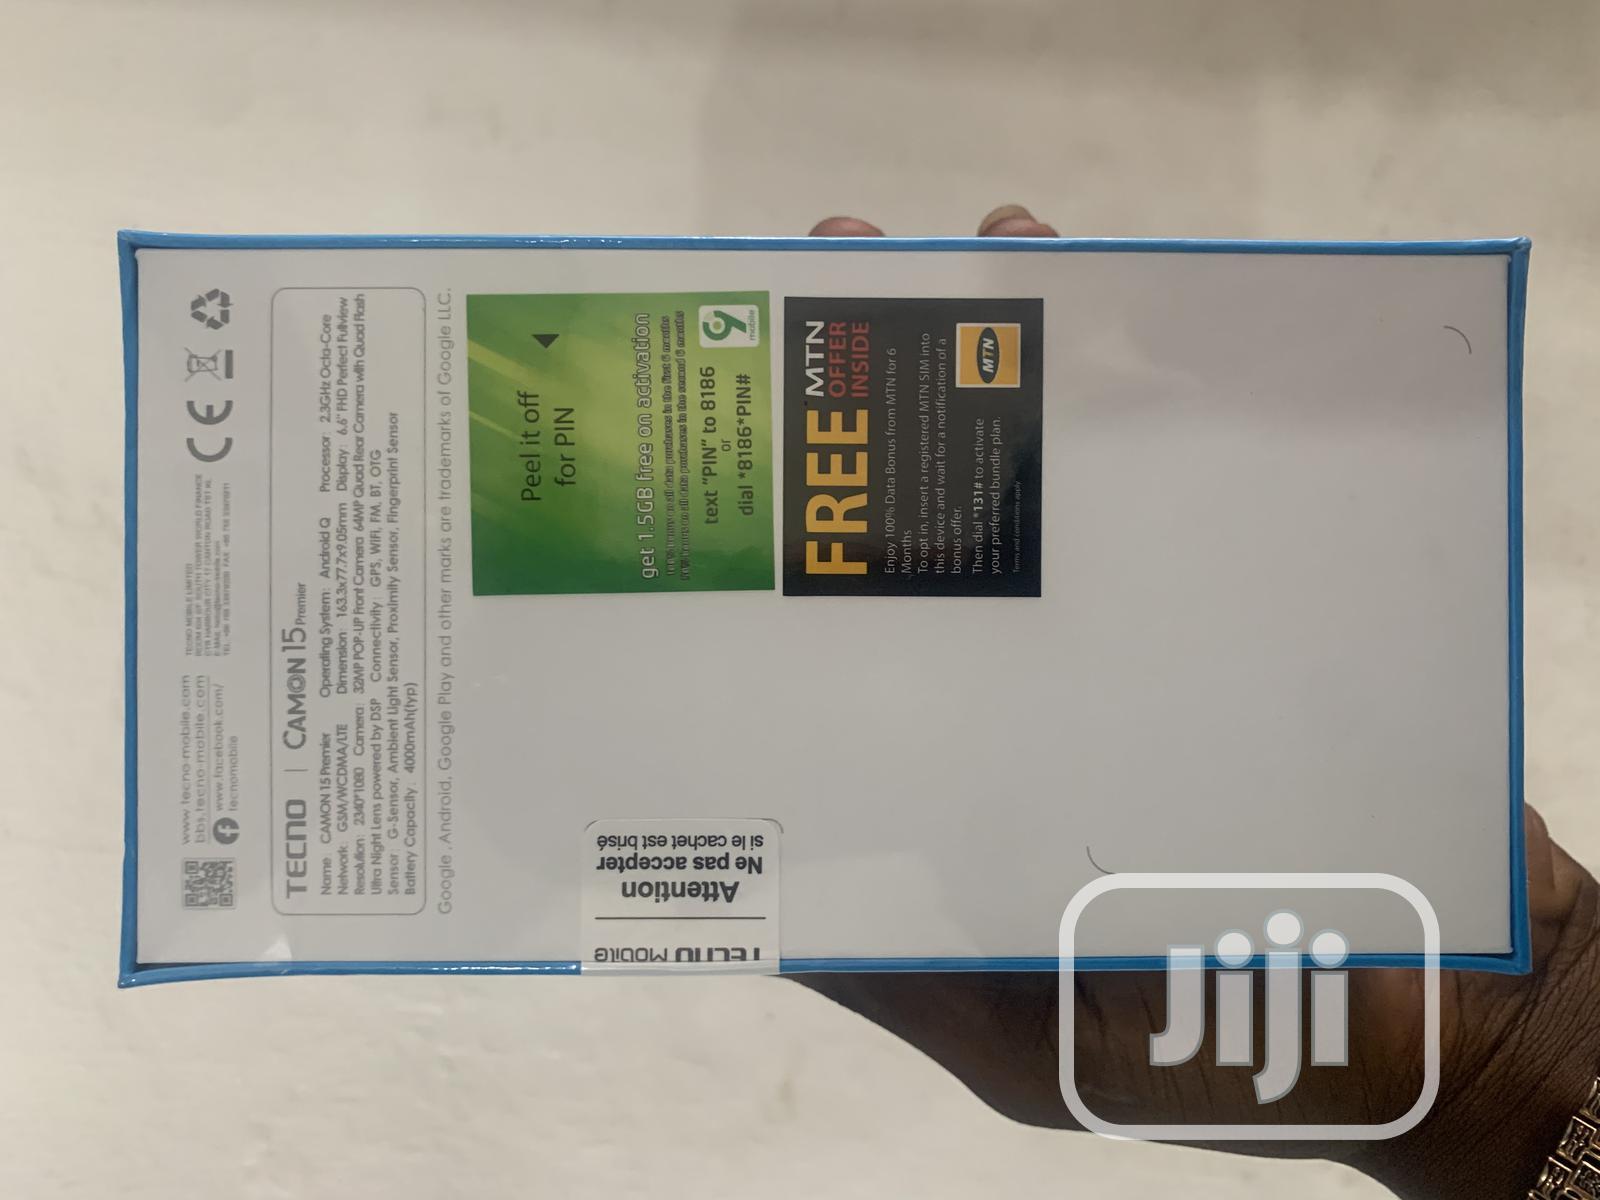 New Tecno Camon 15 Premier 128 GB | Mobile Phones for sale in Ikeja, Lagos State, Nigeria